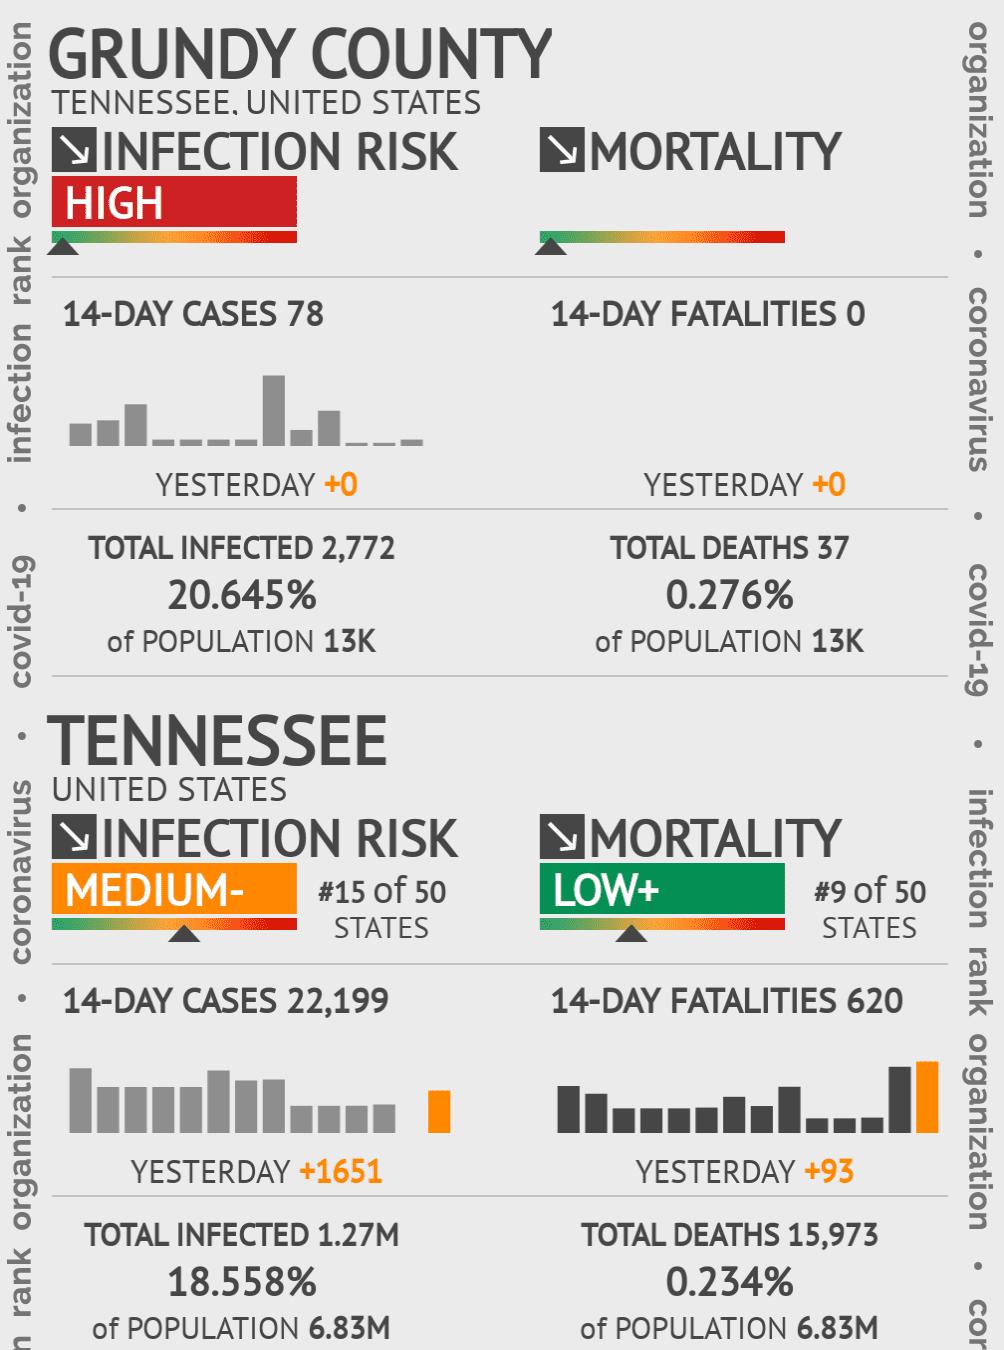 Grundy County Coronavirus Covid-19 Risk of Infection on February 25, 2021